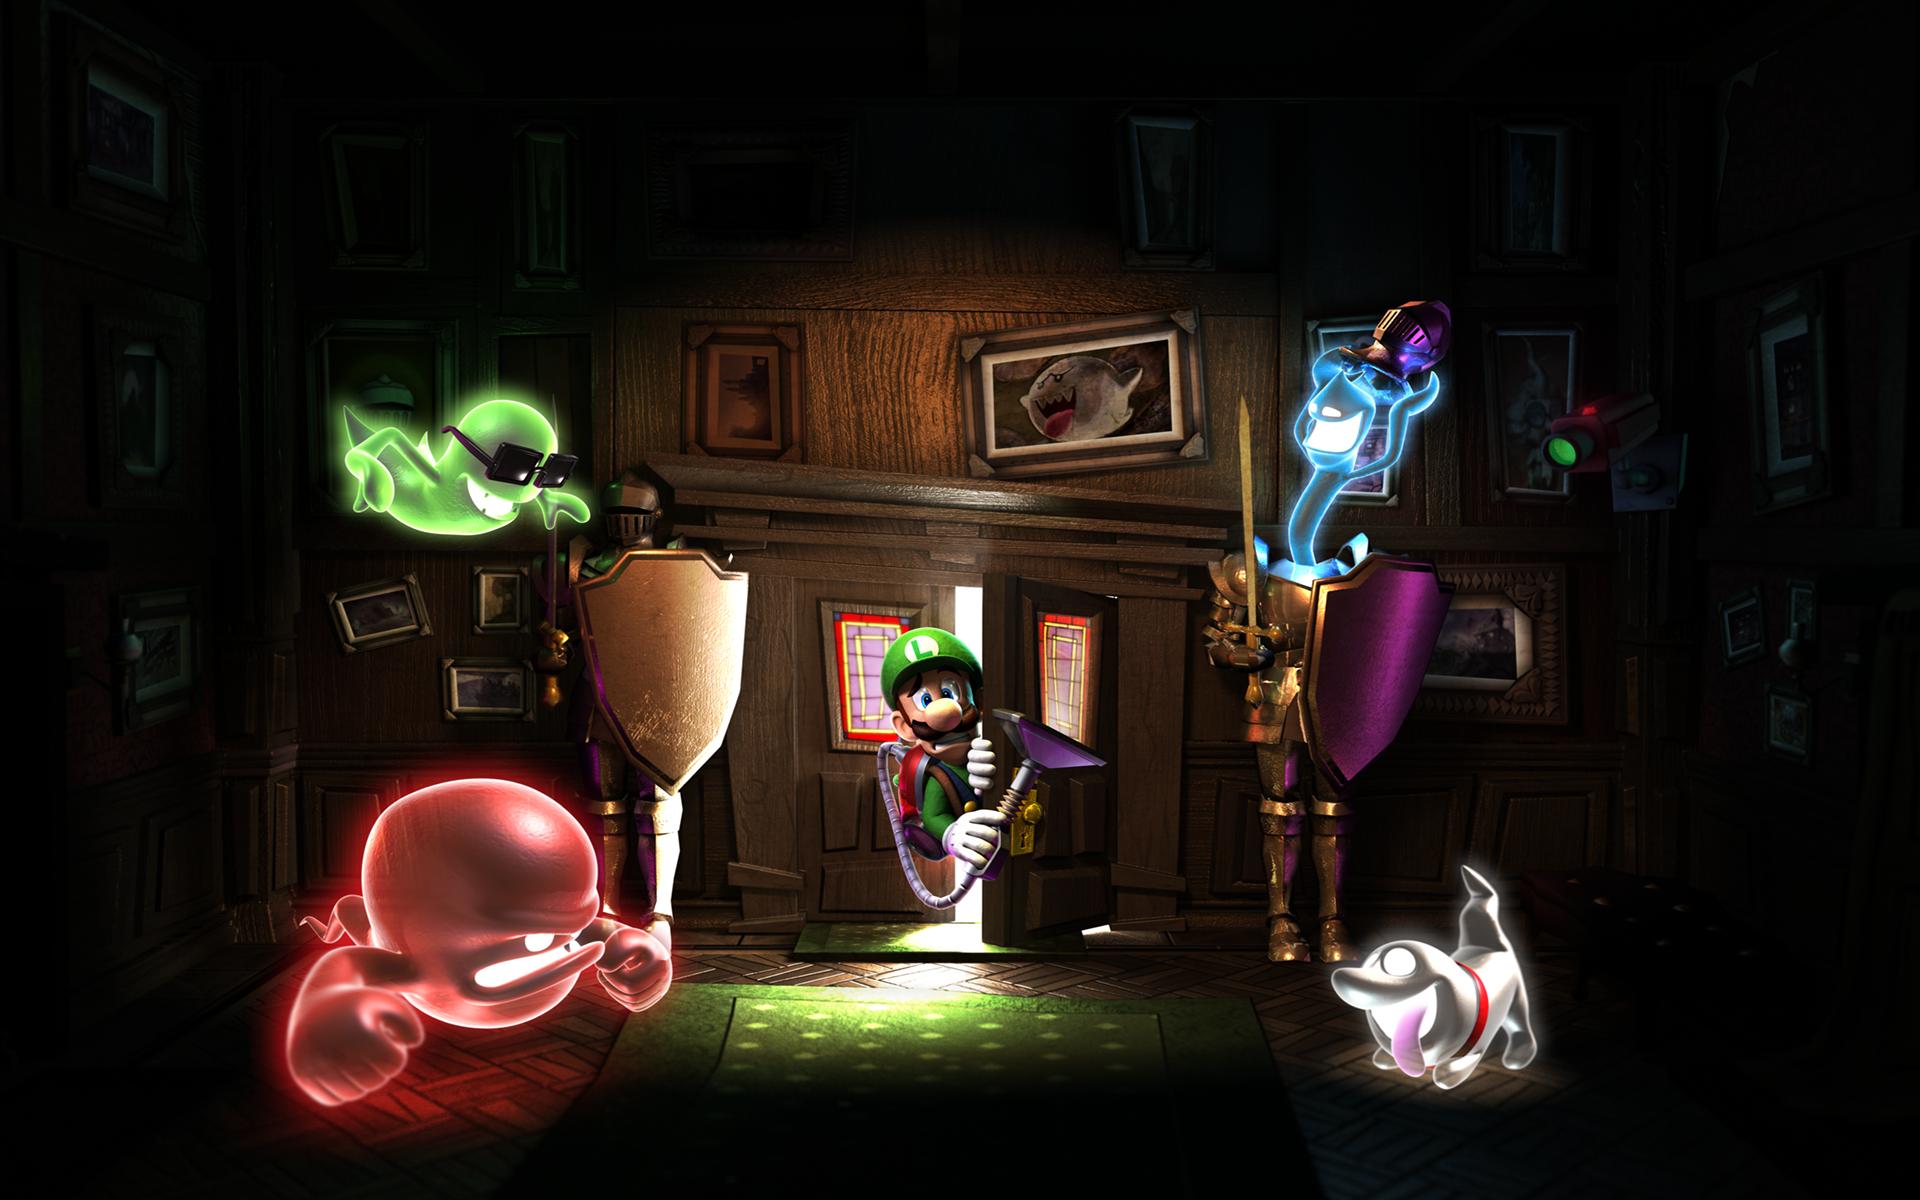 HD Wallpaper | Background Image ID:607436. 1920x1200 Video Game Luigi's Mansion